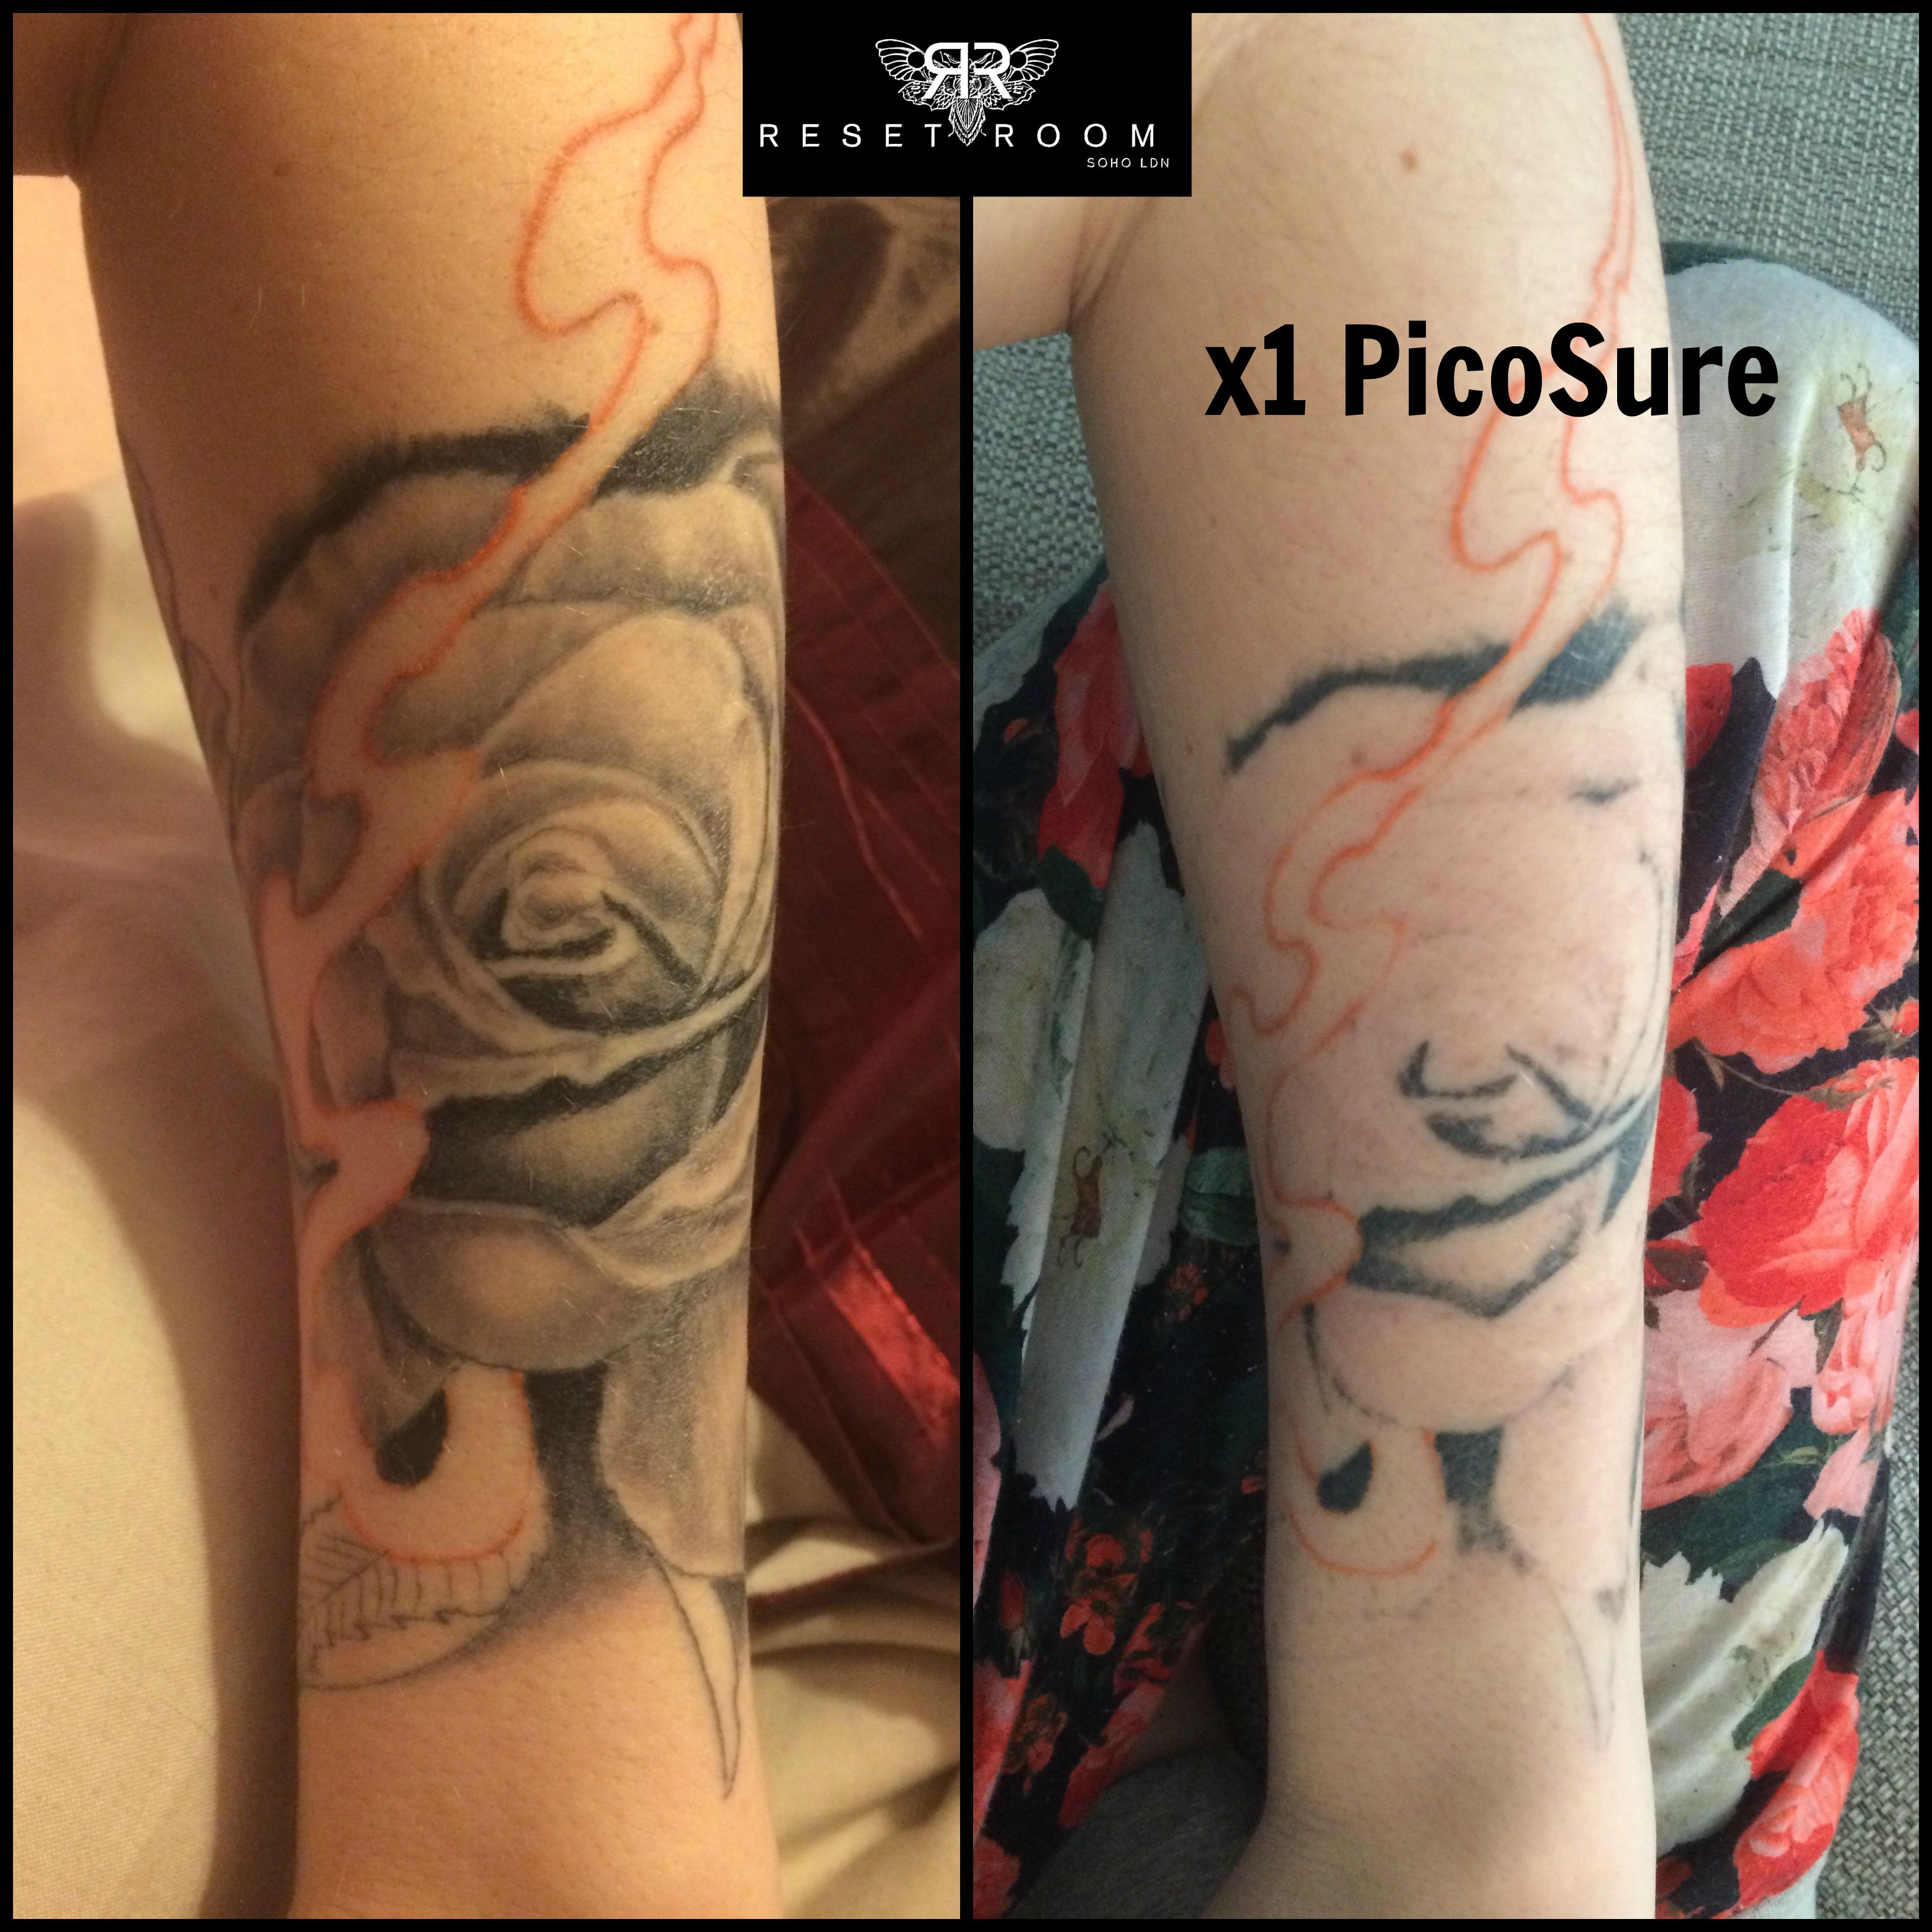 Change Is Not Regret Laser Tattoo Tattoo Removal Laser Tattoo Removal